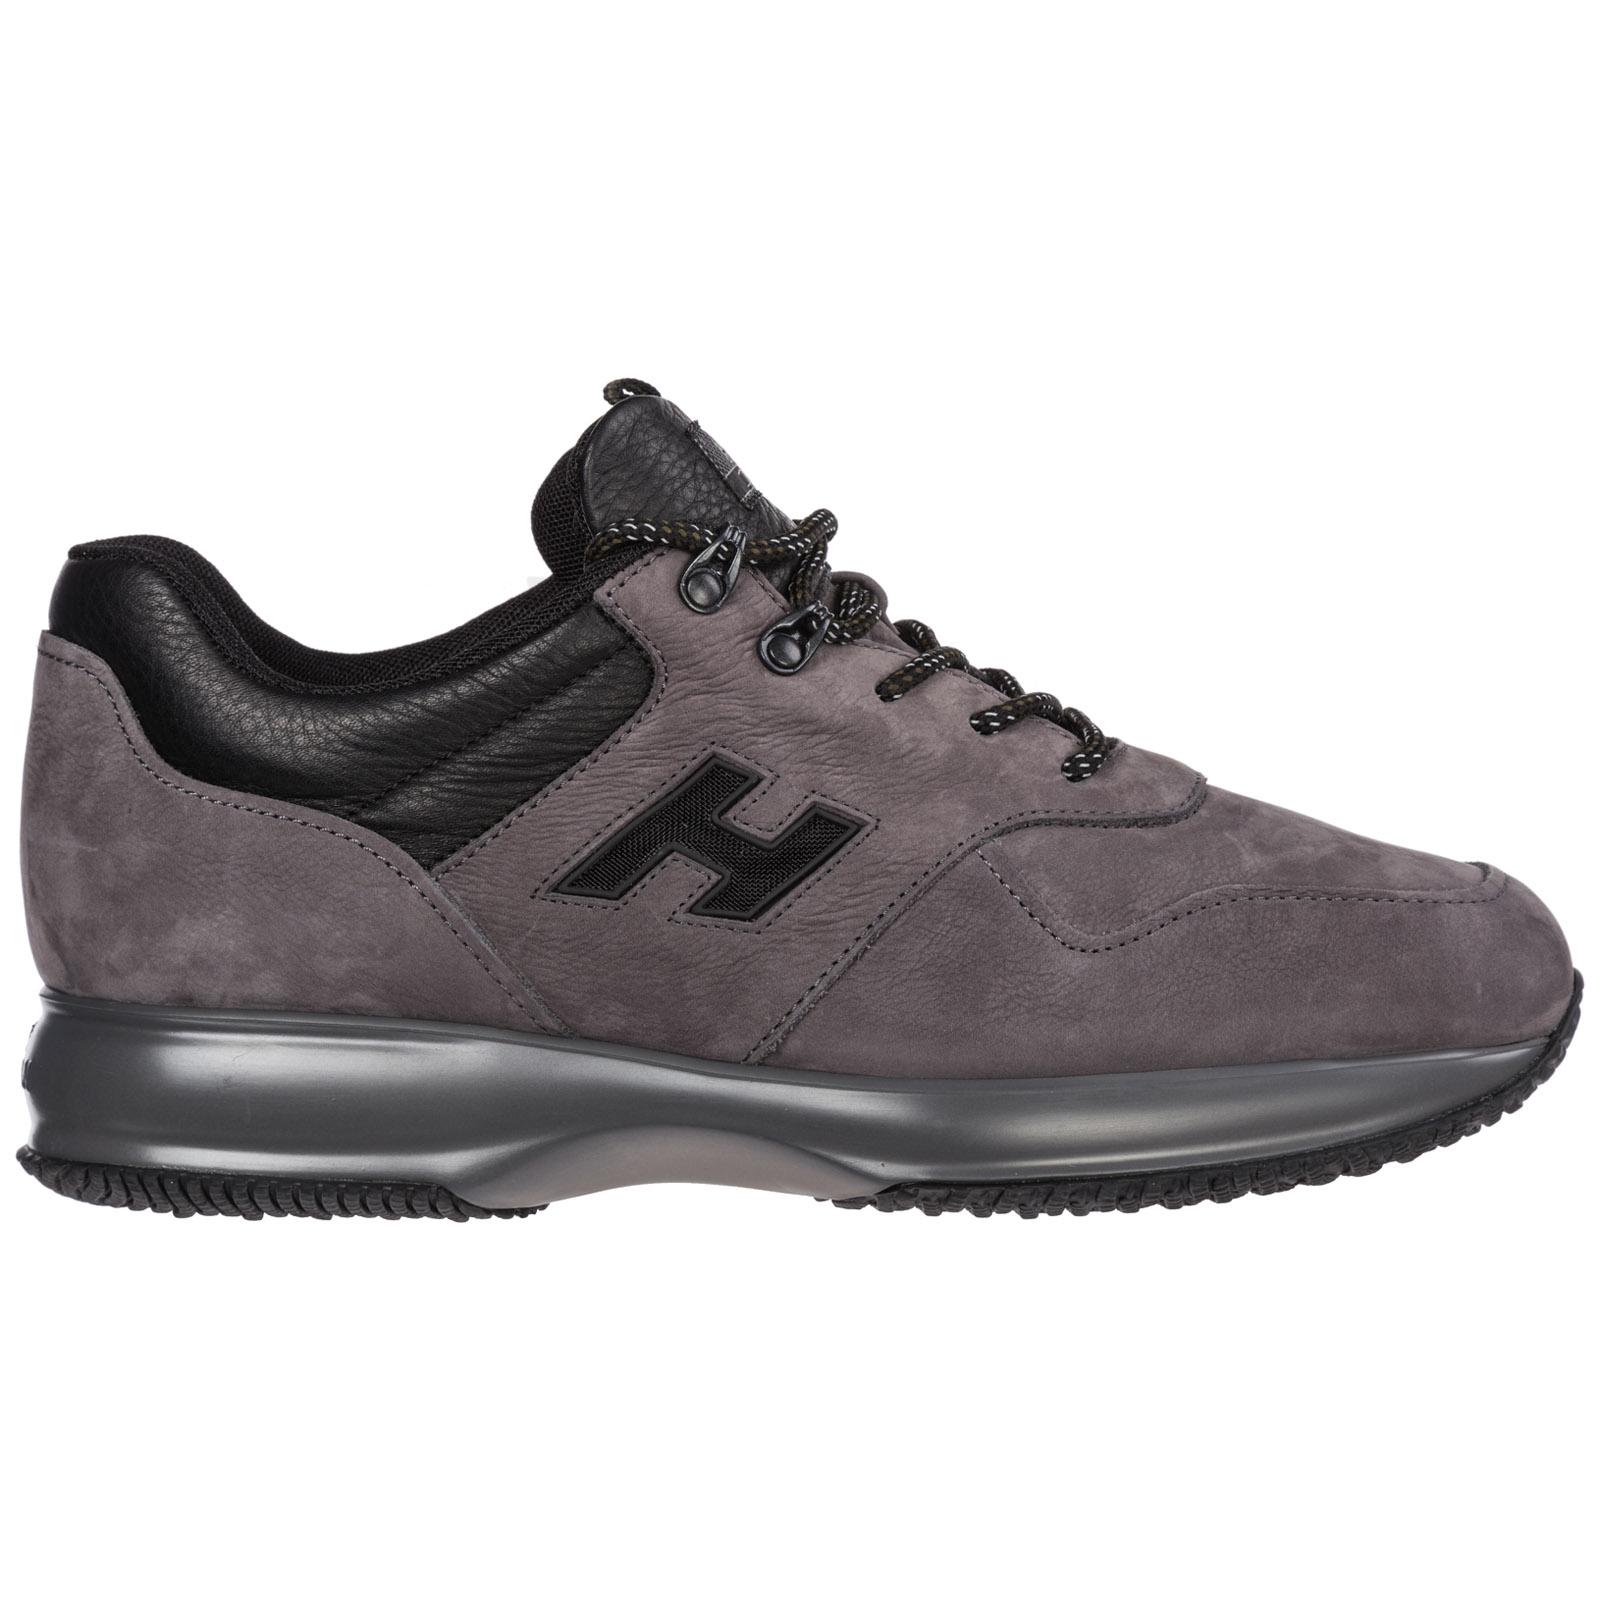 plus récent 31abf 88198 Chaussures baskets sneakers homme en cuir interactive